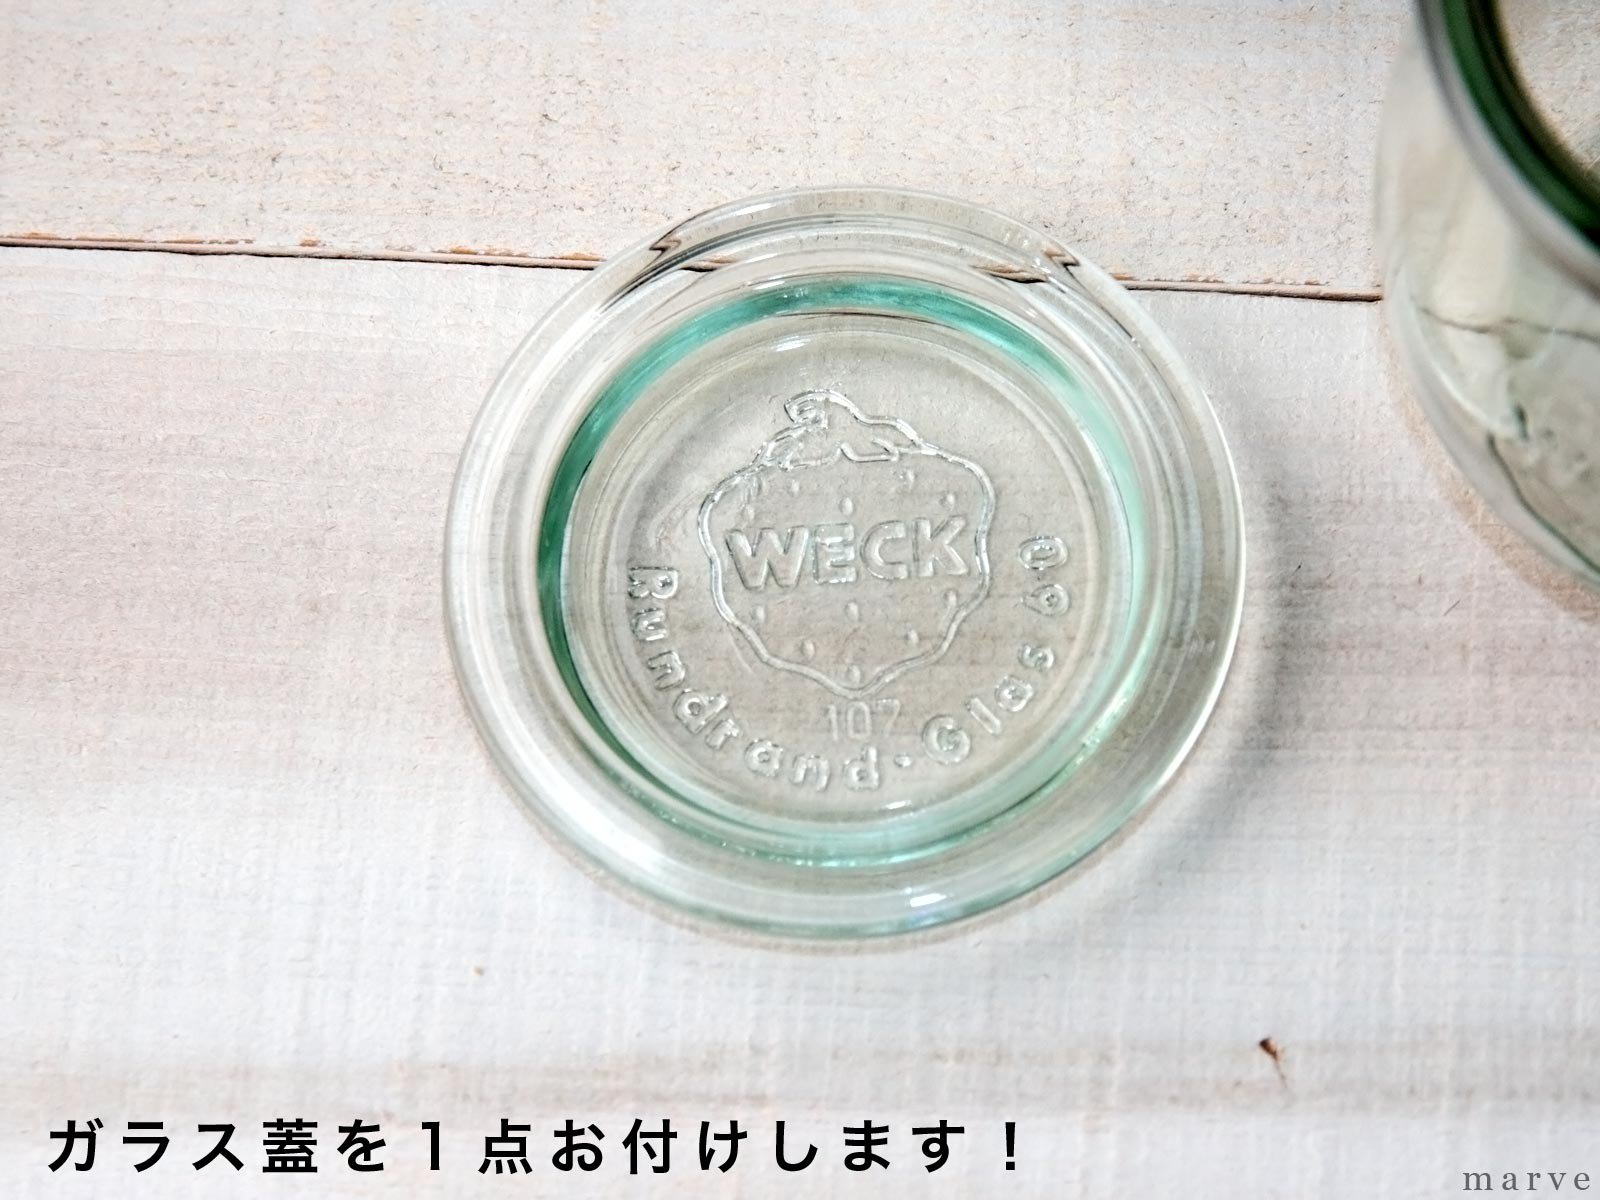 WECK MUG  WHITE ウェックマグ白 200ml ガラス蓋付き